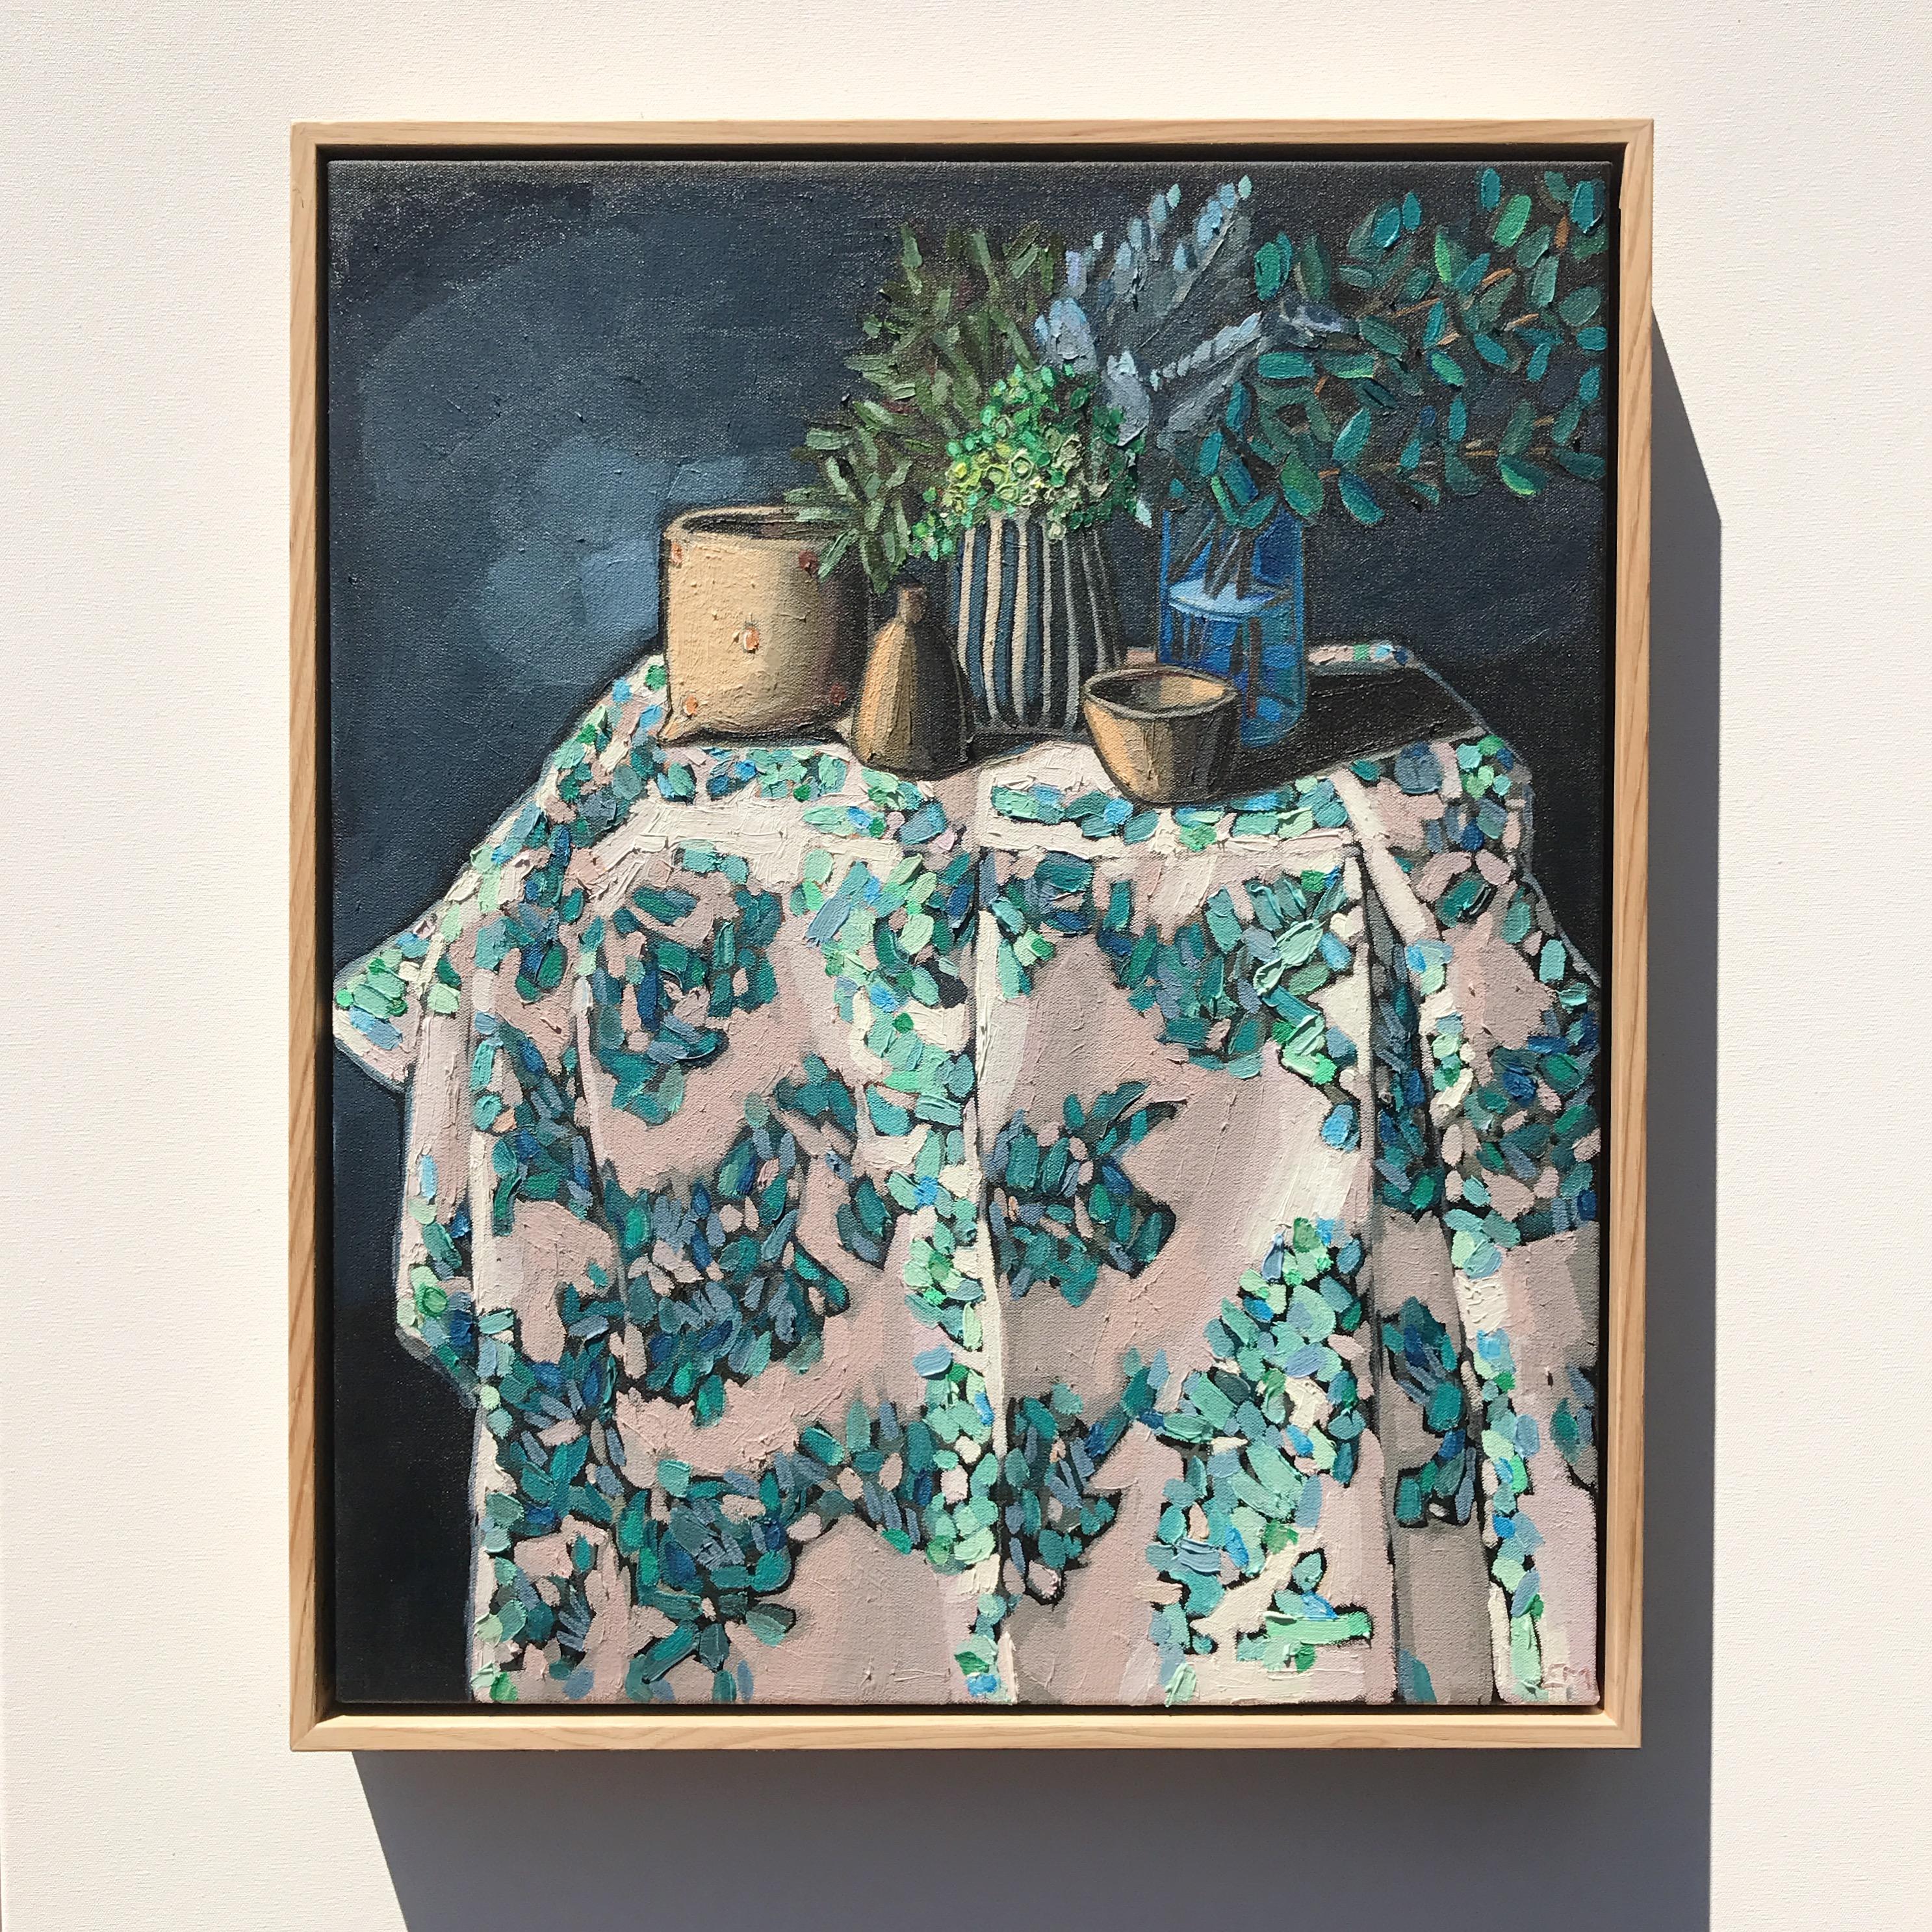 'Turquoise & Cloth' 59x49cm $1,295